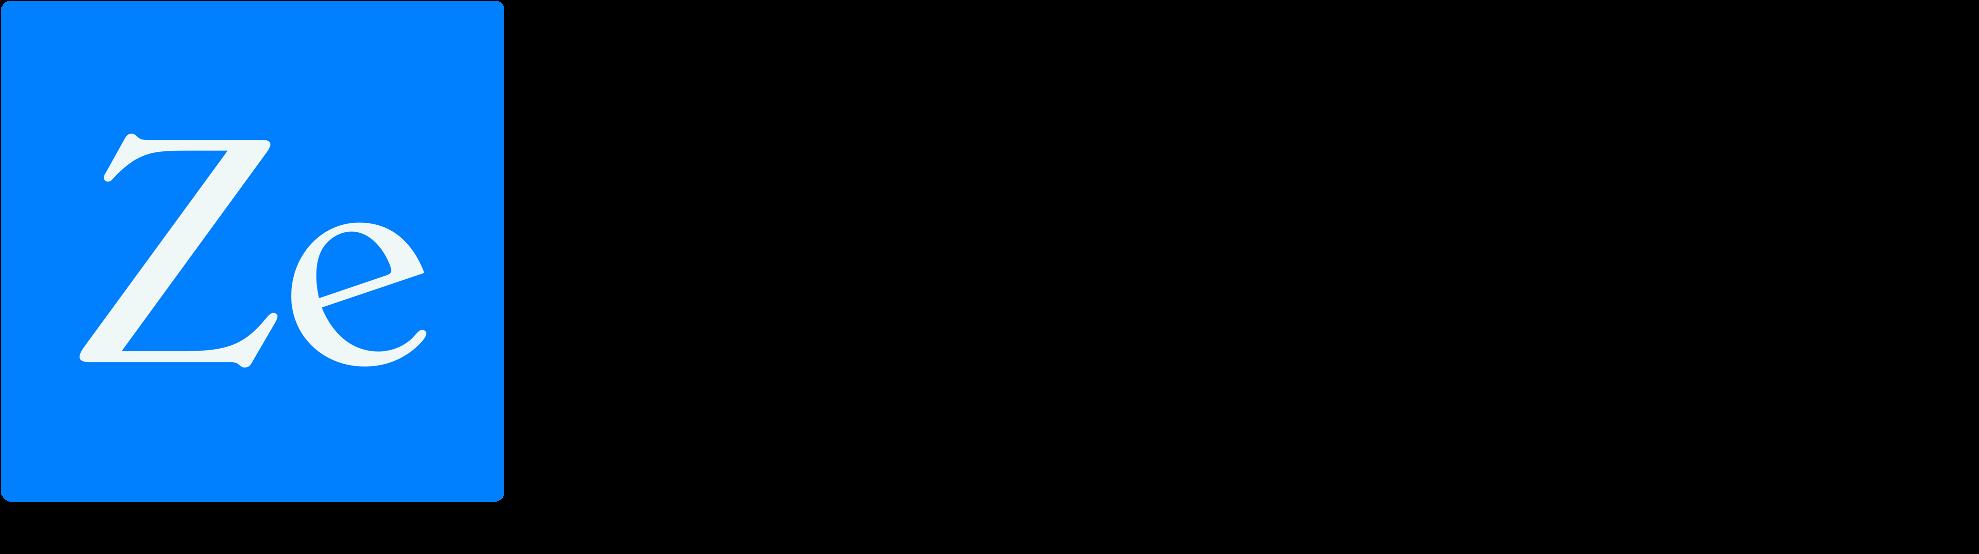 Zebrium logo horizontal